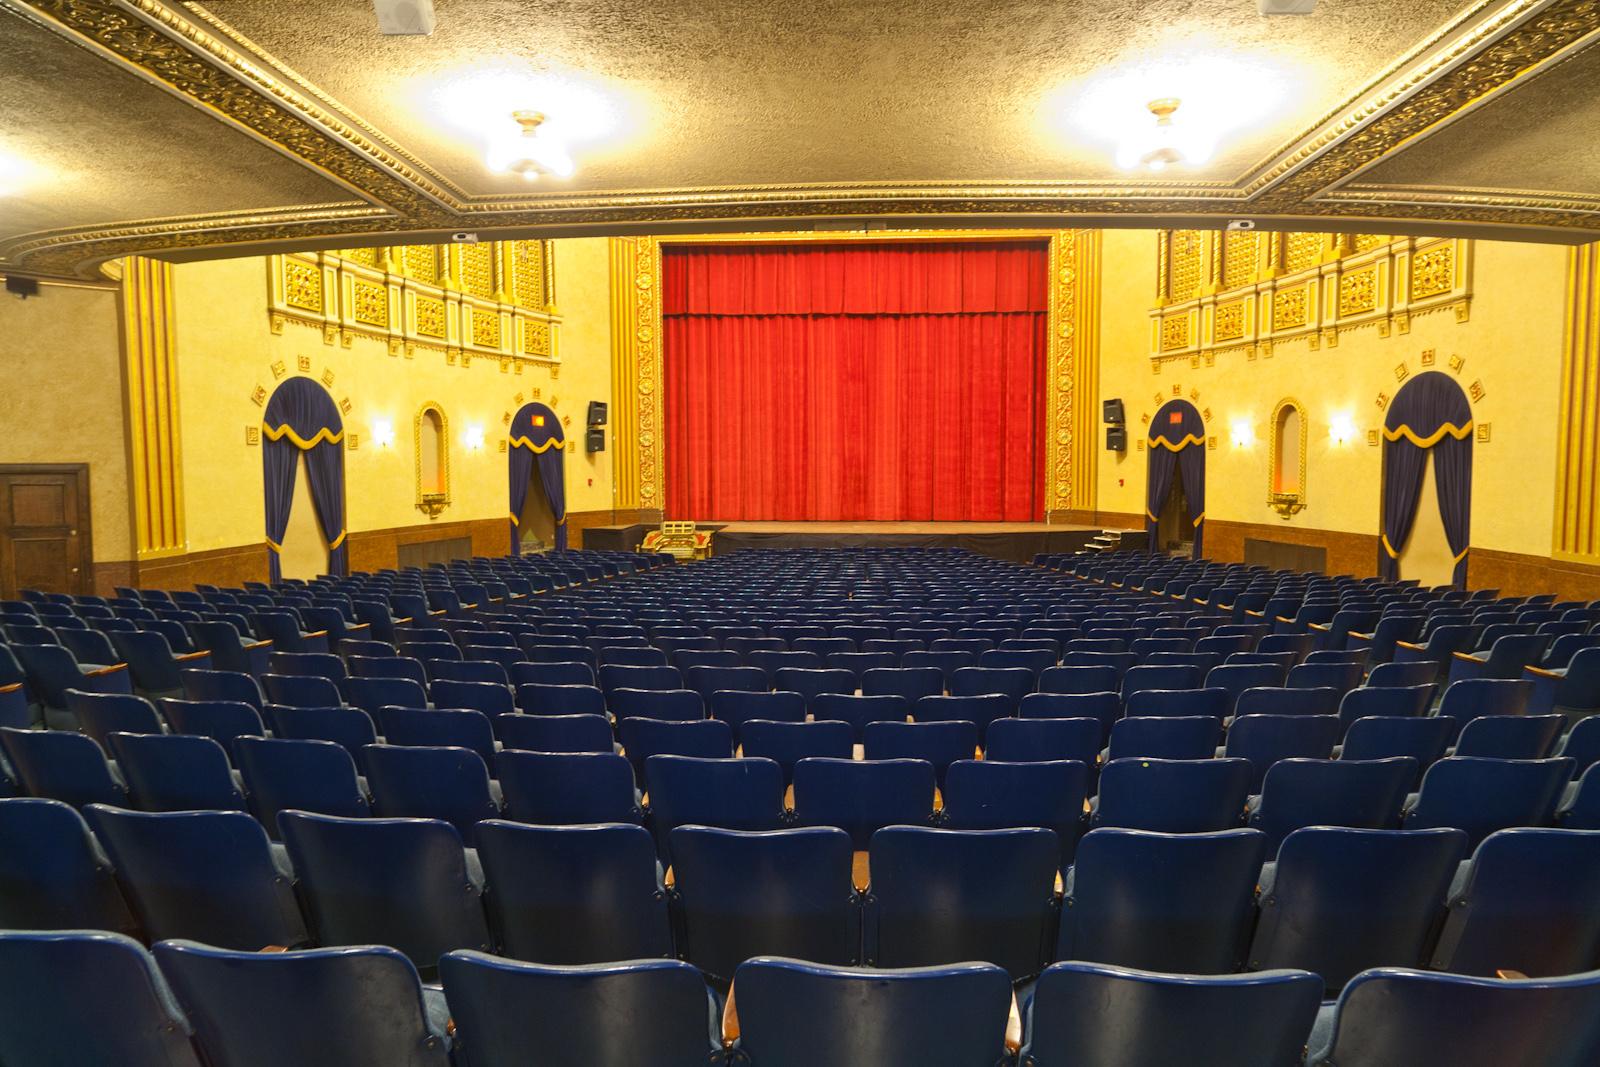 Michigan_Theater_Seats.jpg